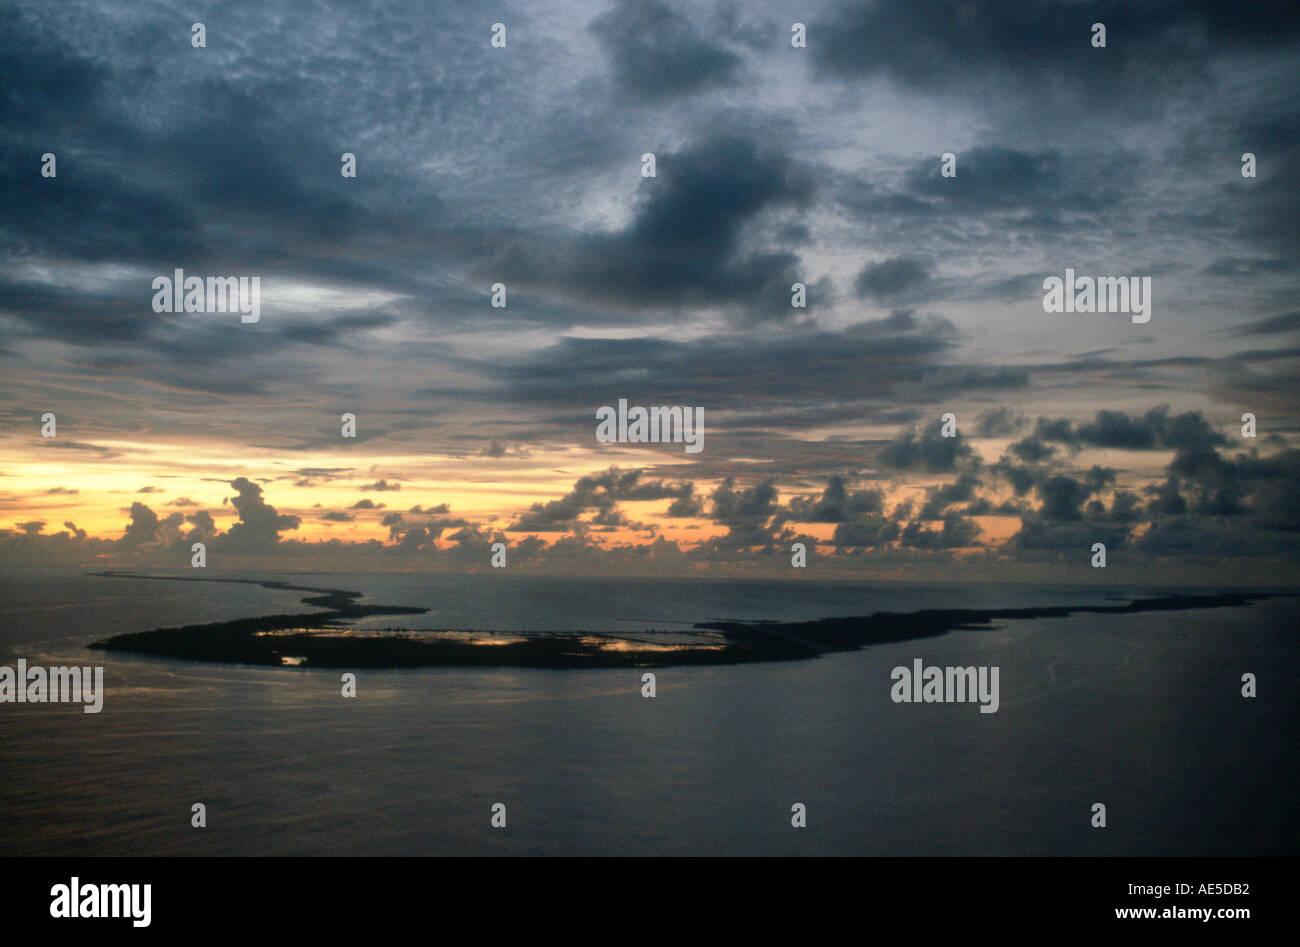 Island of Kiribati in the South Pacific - Stock Image